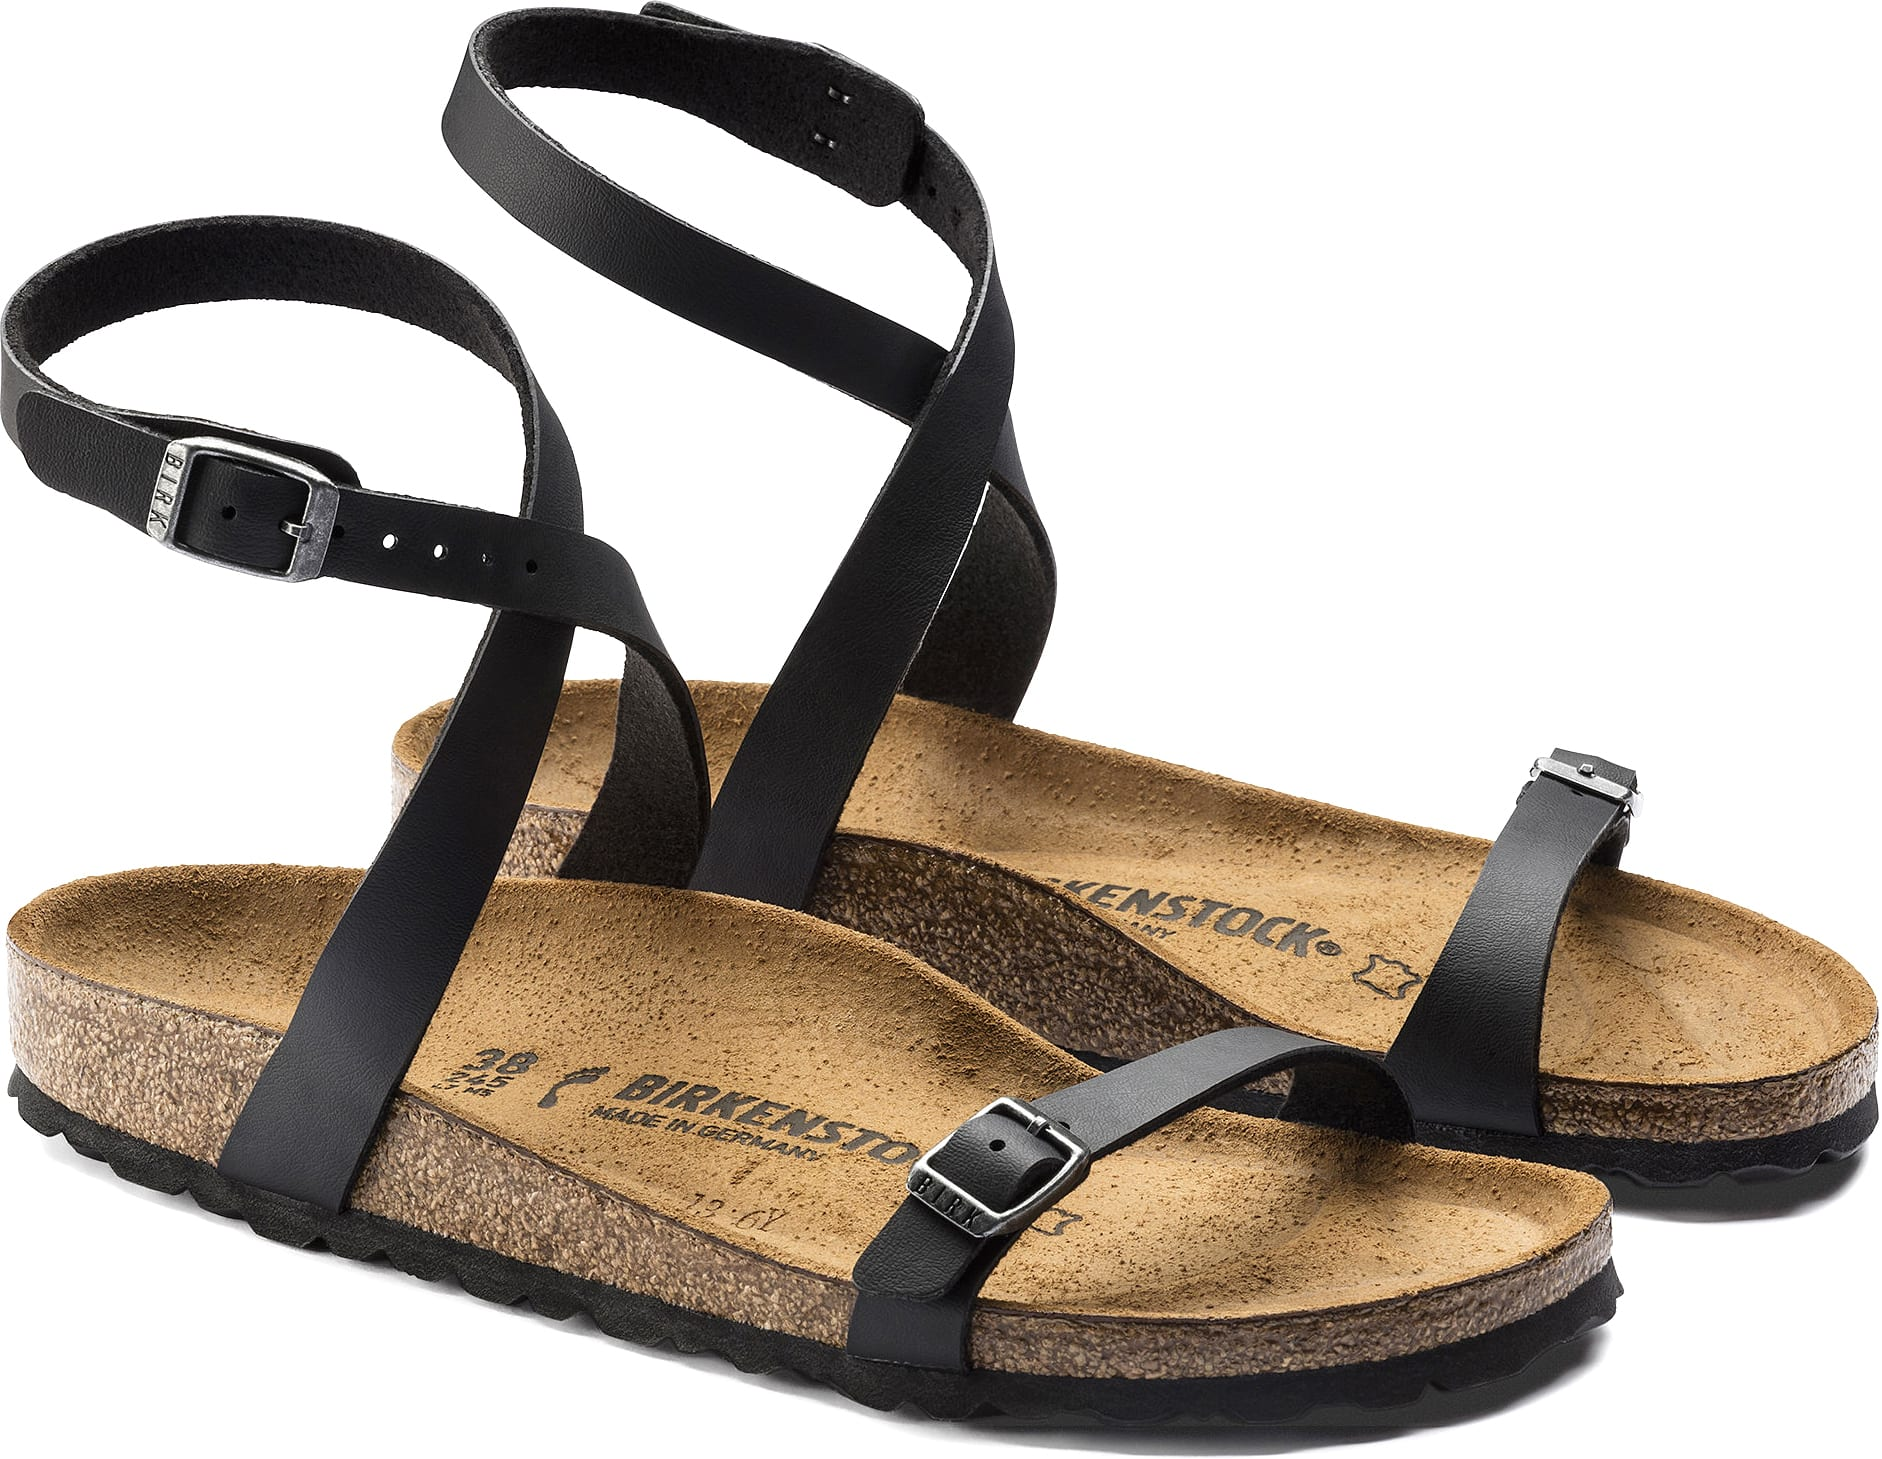 5500f7d3c70 Birkenstock Daloa Sandals - Womens 2019